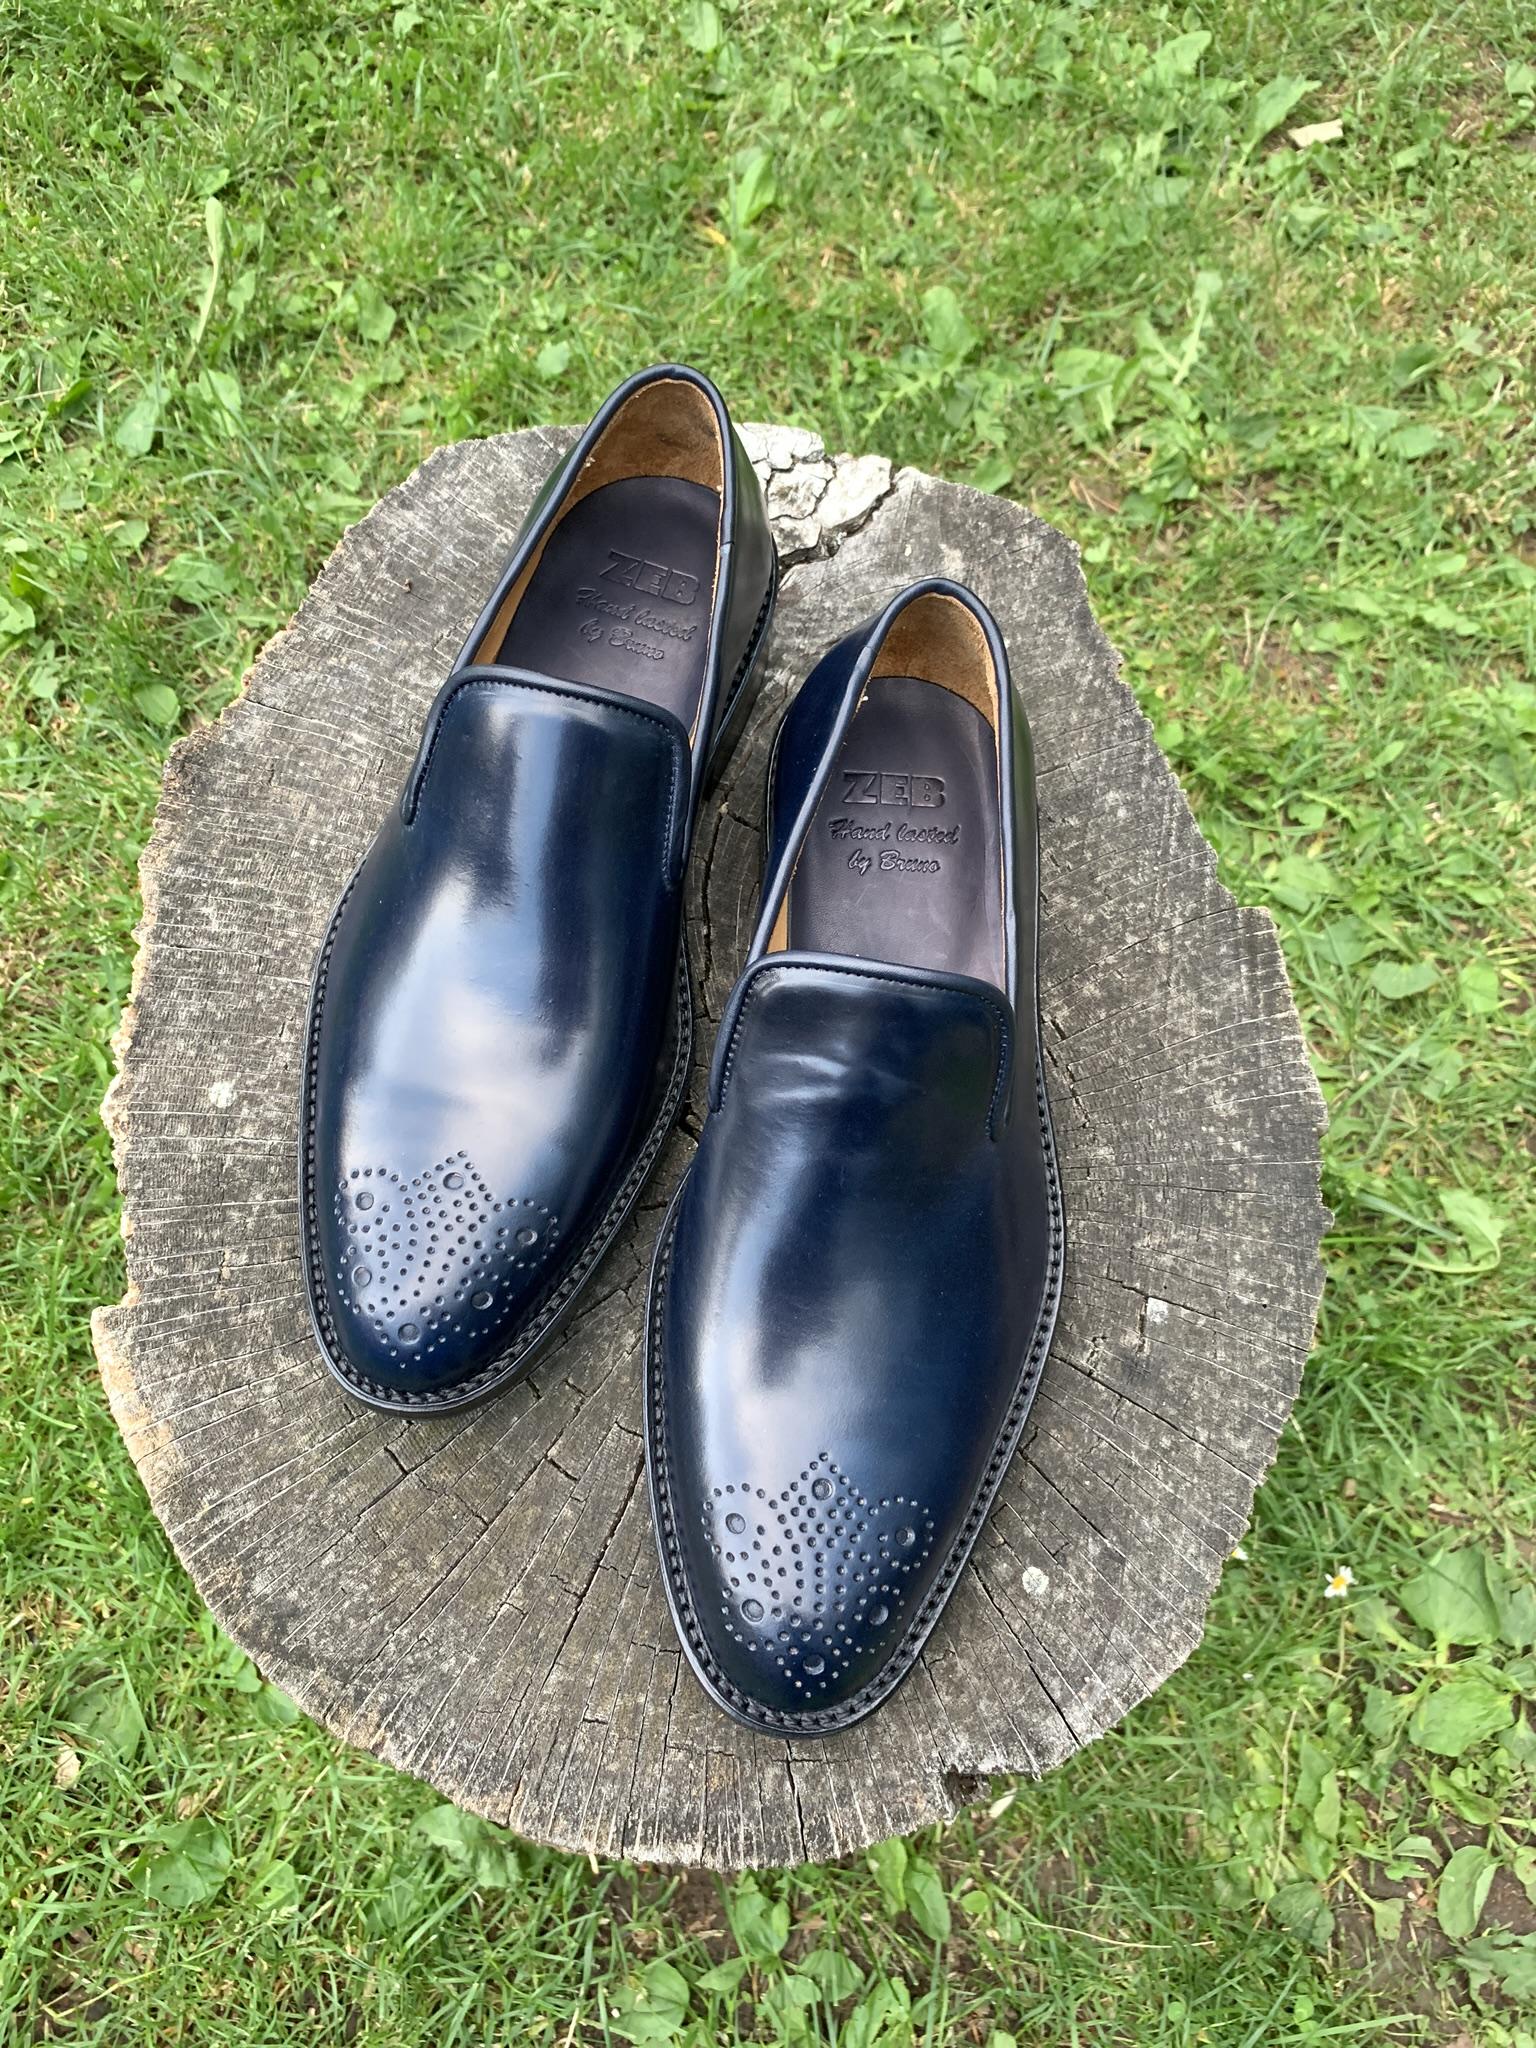 Navy Horween shell cordovan slipper